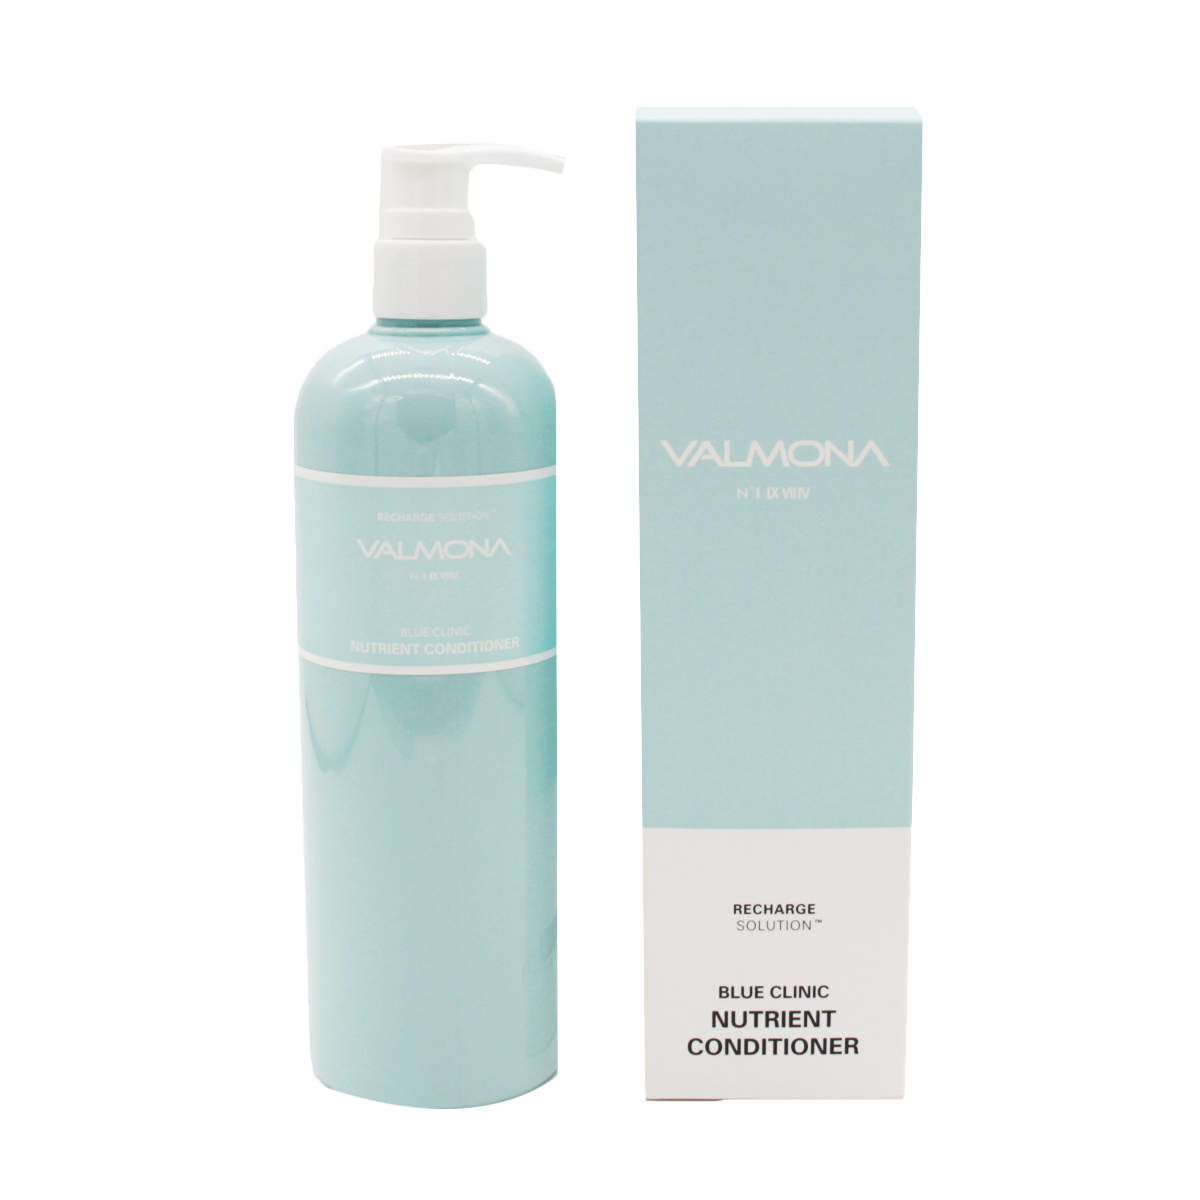 VALMONA Кондиционер для волос VALMONA увлажнение Recharge Solution Blue Clinic Nutrient Conditioner,480 мл. 8802929004433.png